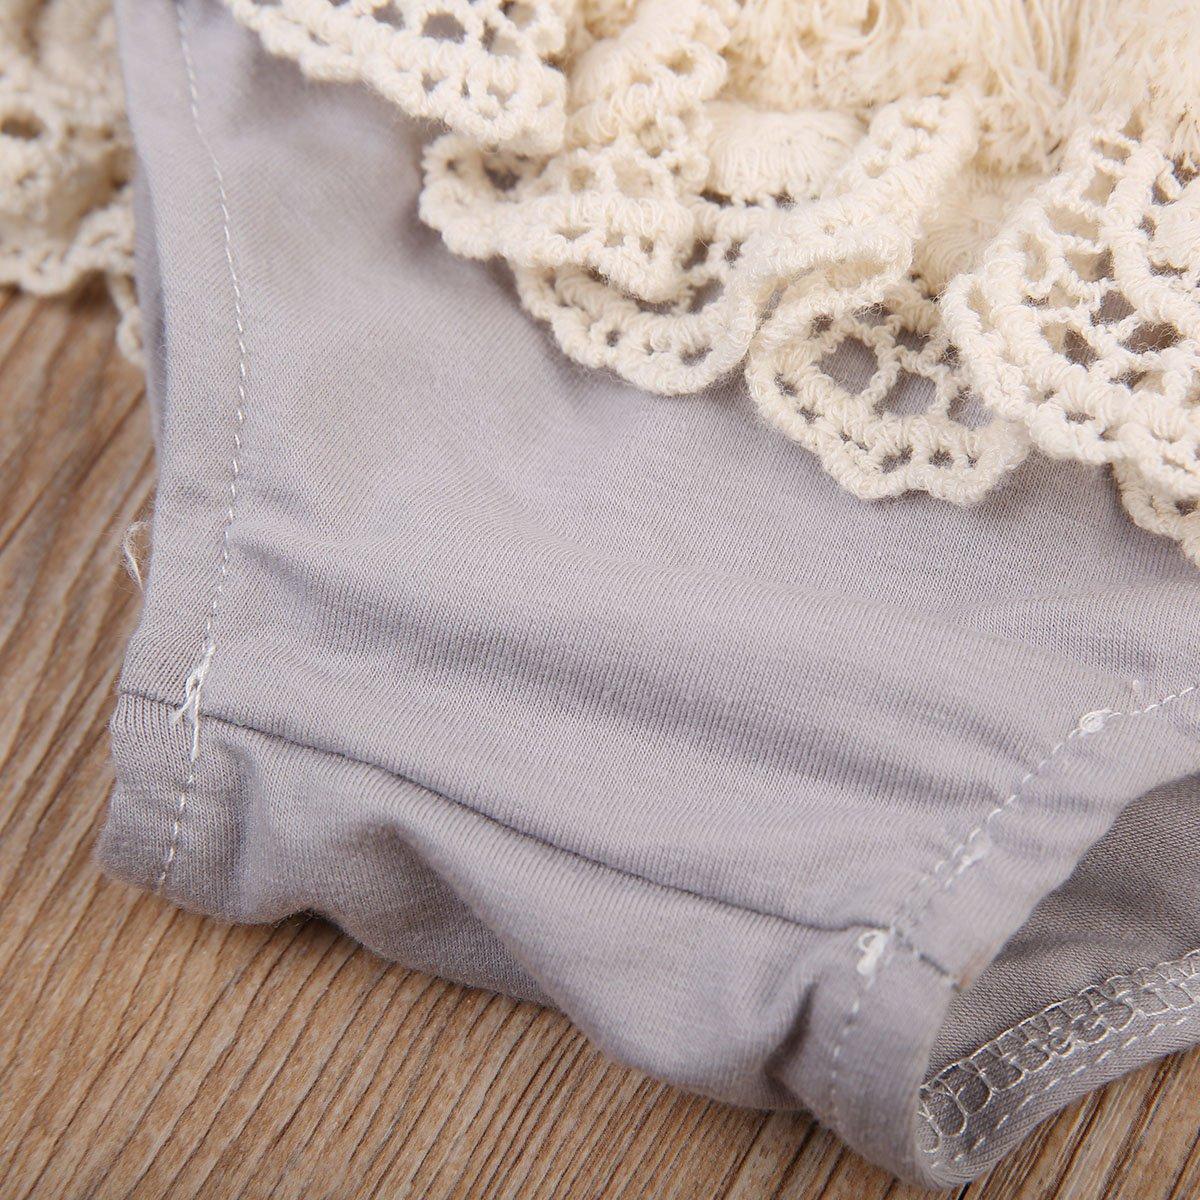 Newborn Baby Girls Tassel Lace-up Diaper Covers Bloomers Panties